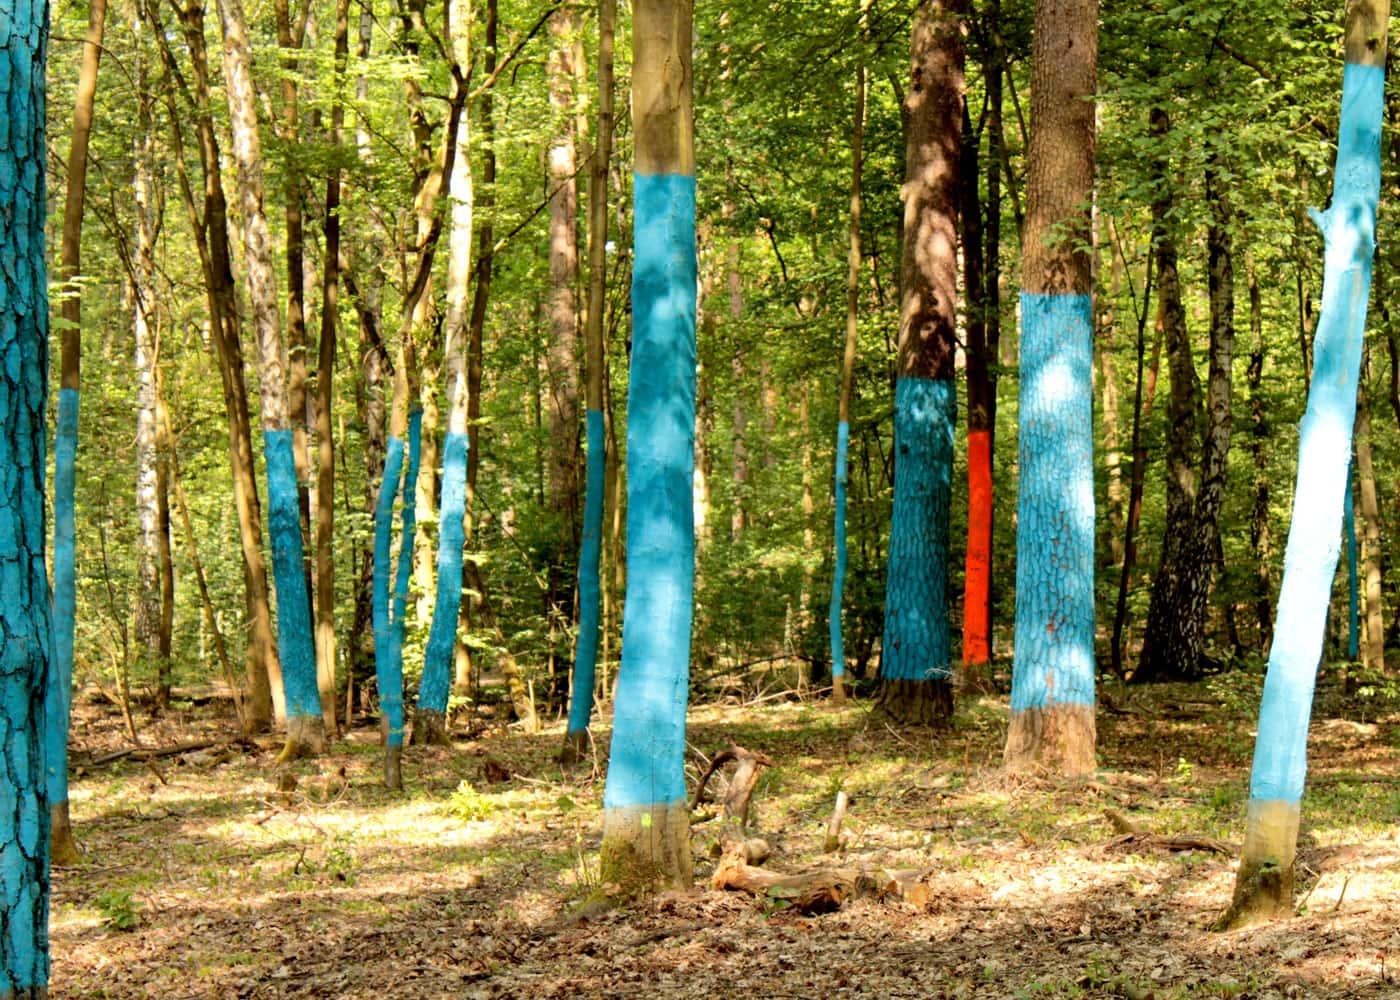 Wald.Berlin.Klima – Outdoor-Ausstellung im Grunewald // HIMBEER